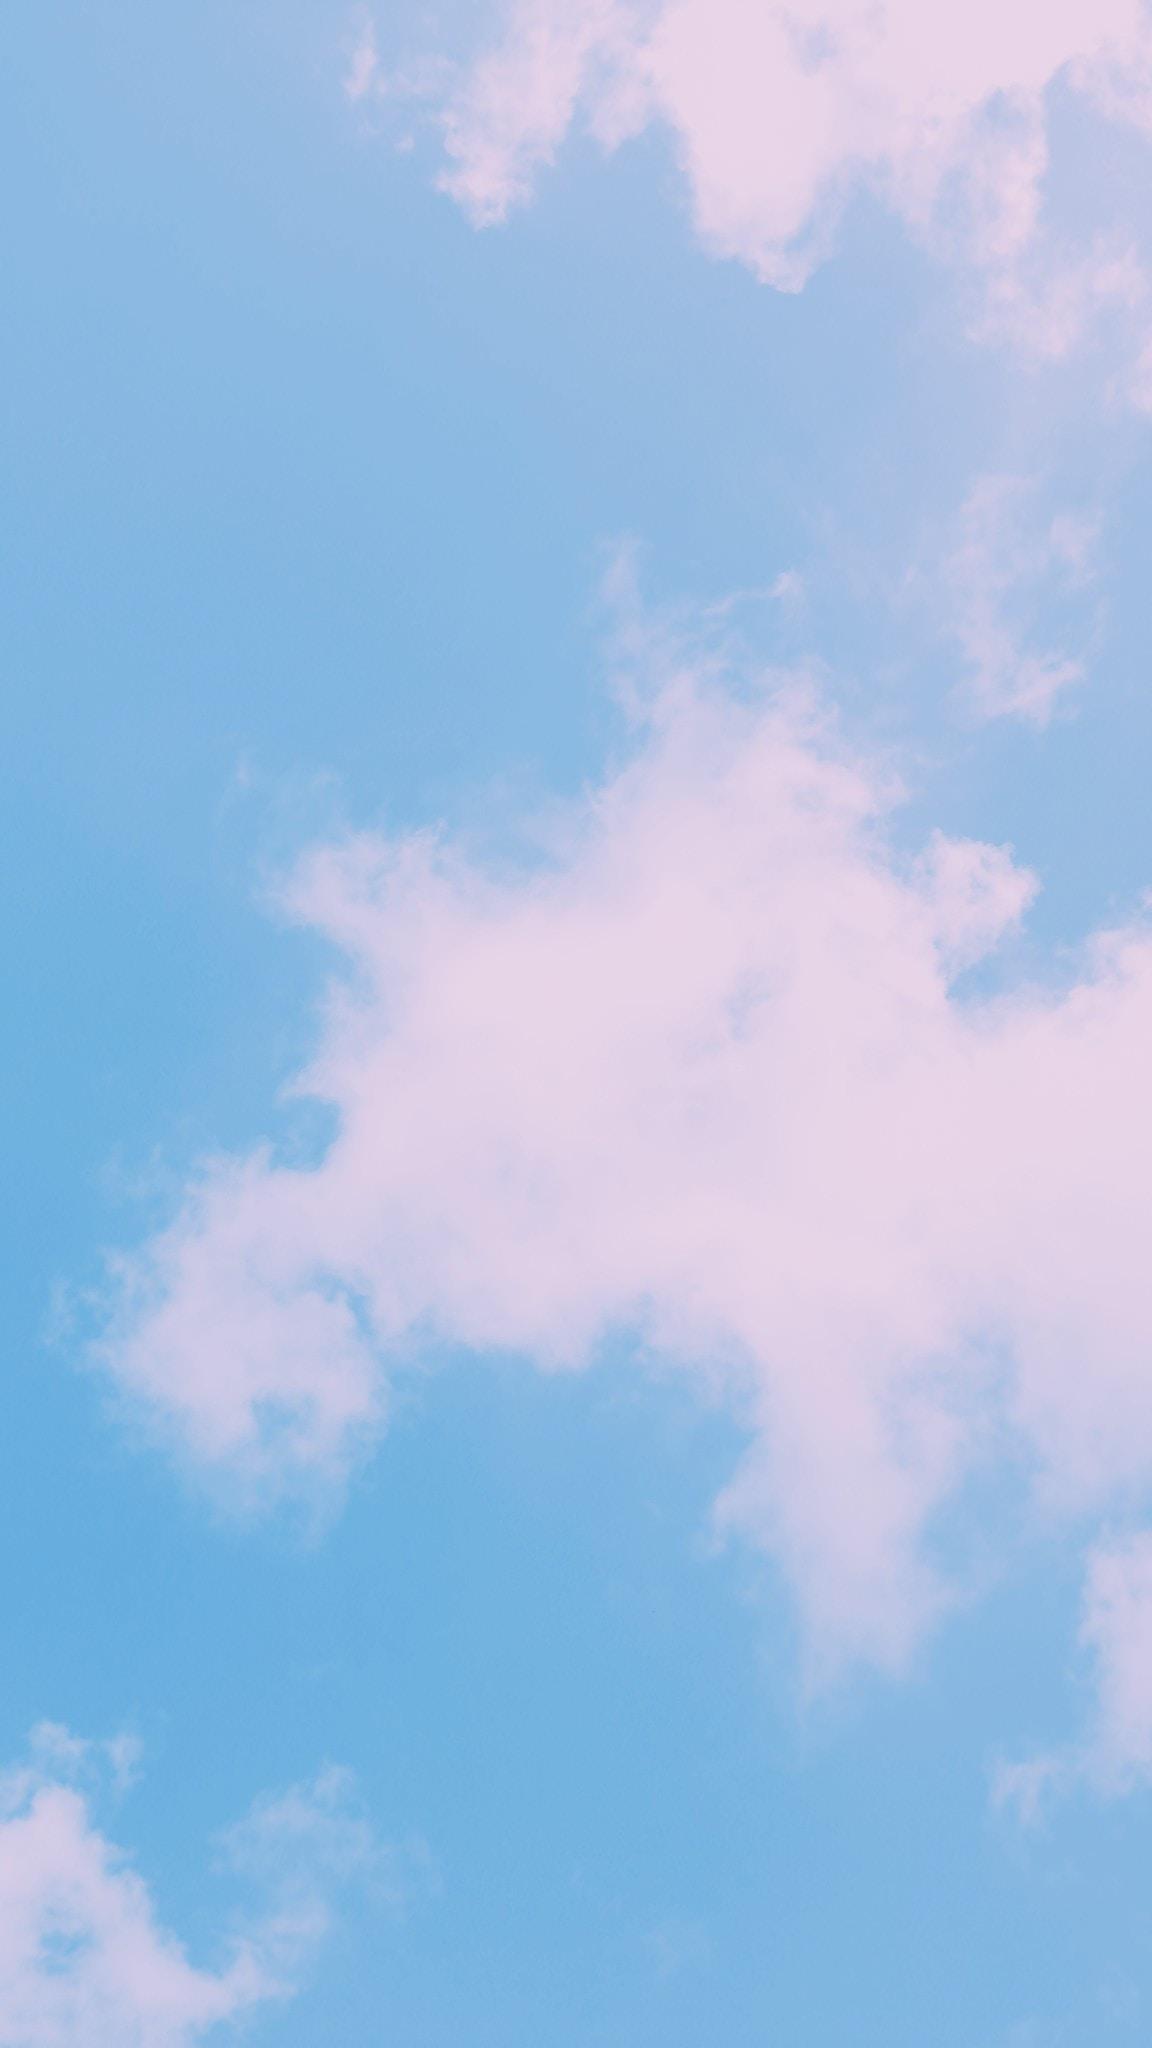 Go to Noitu Love's profile